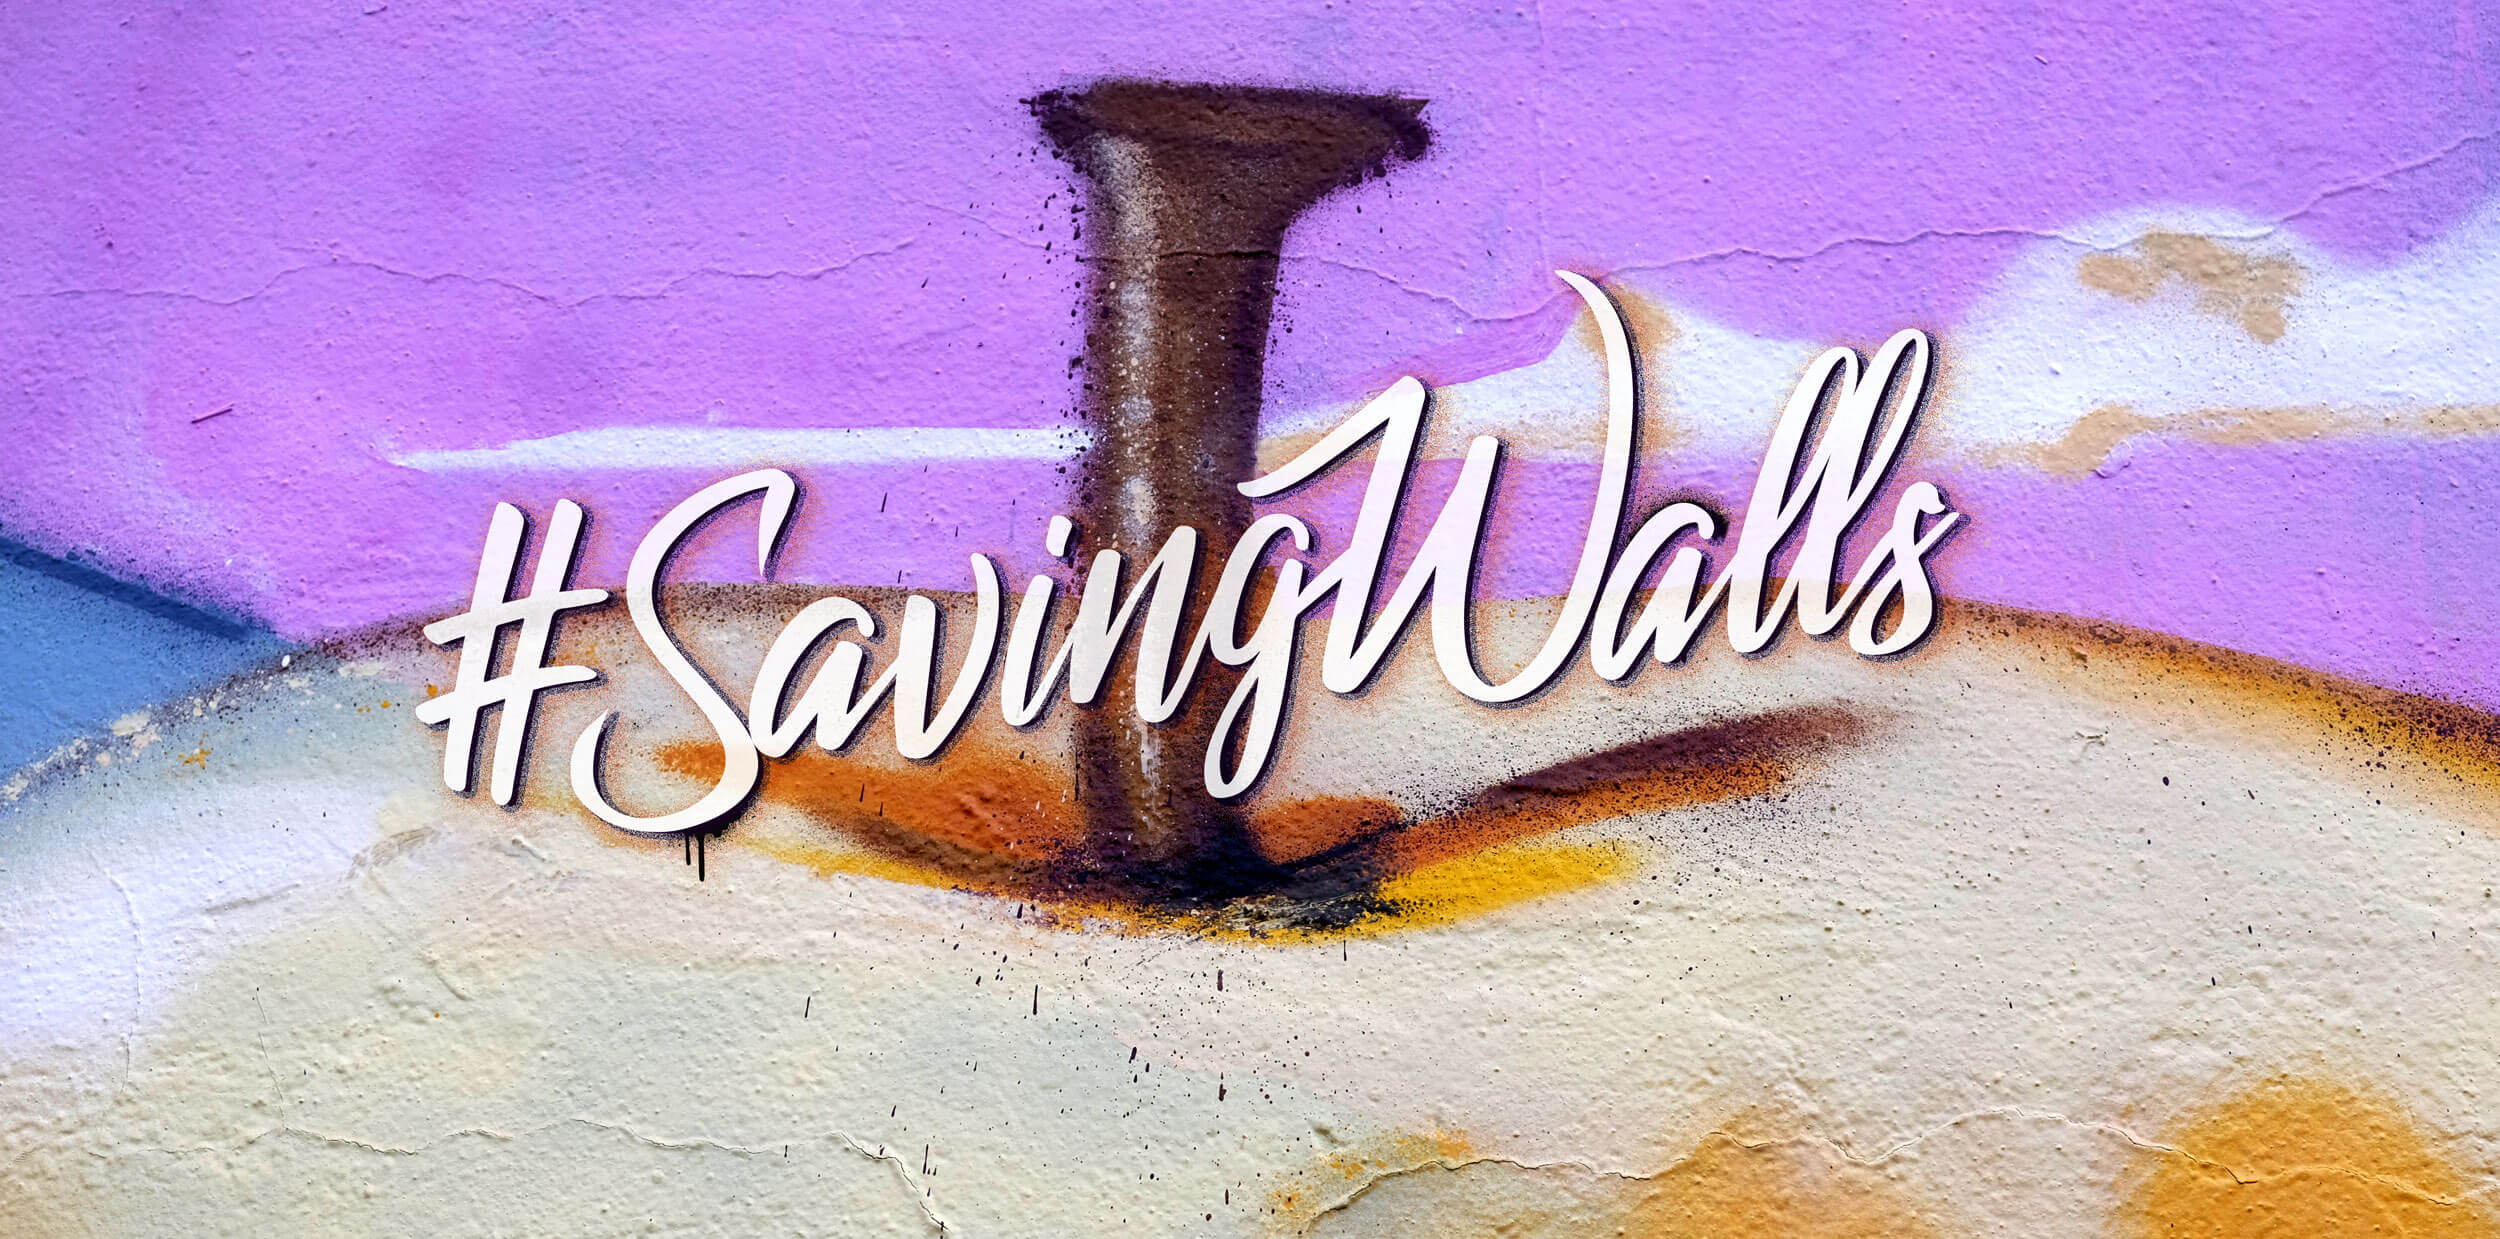 #SavingWalls